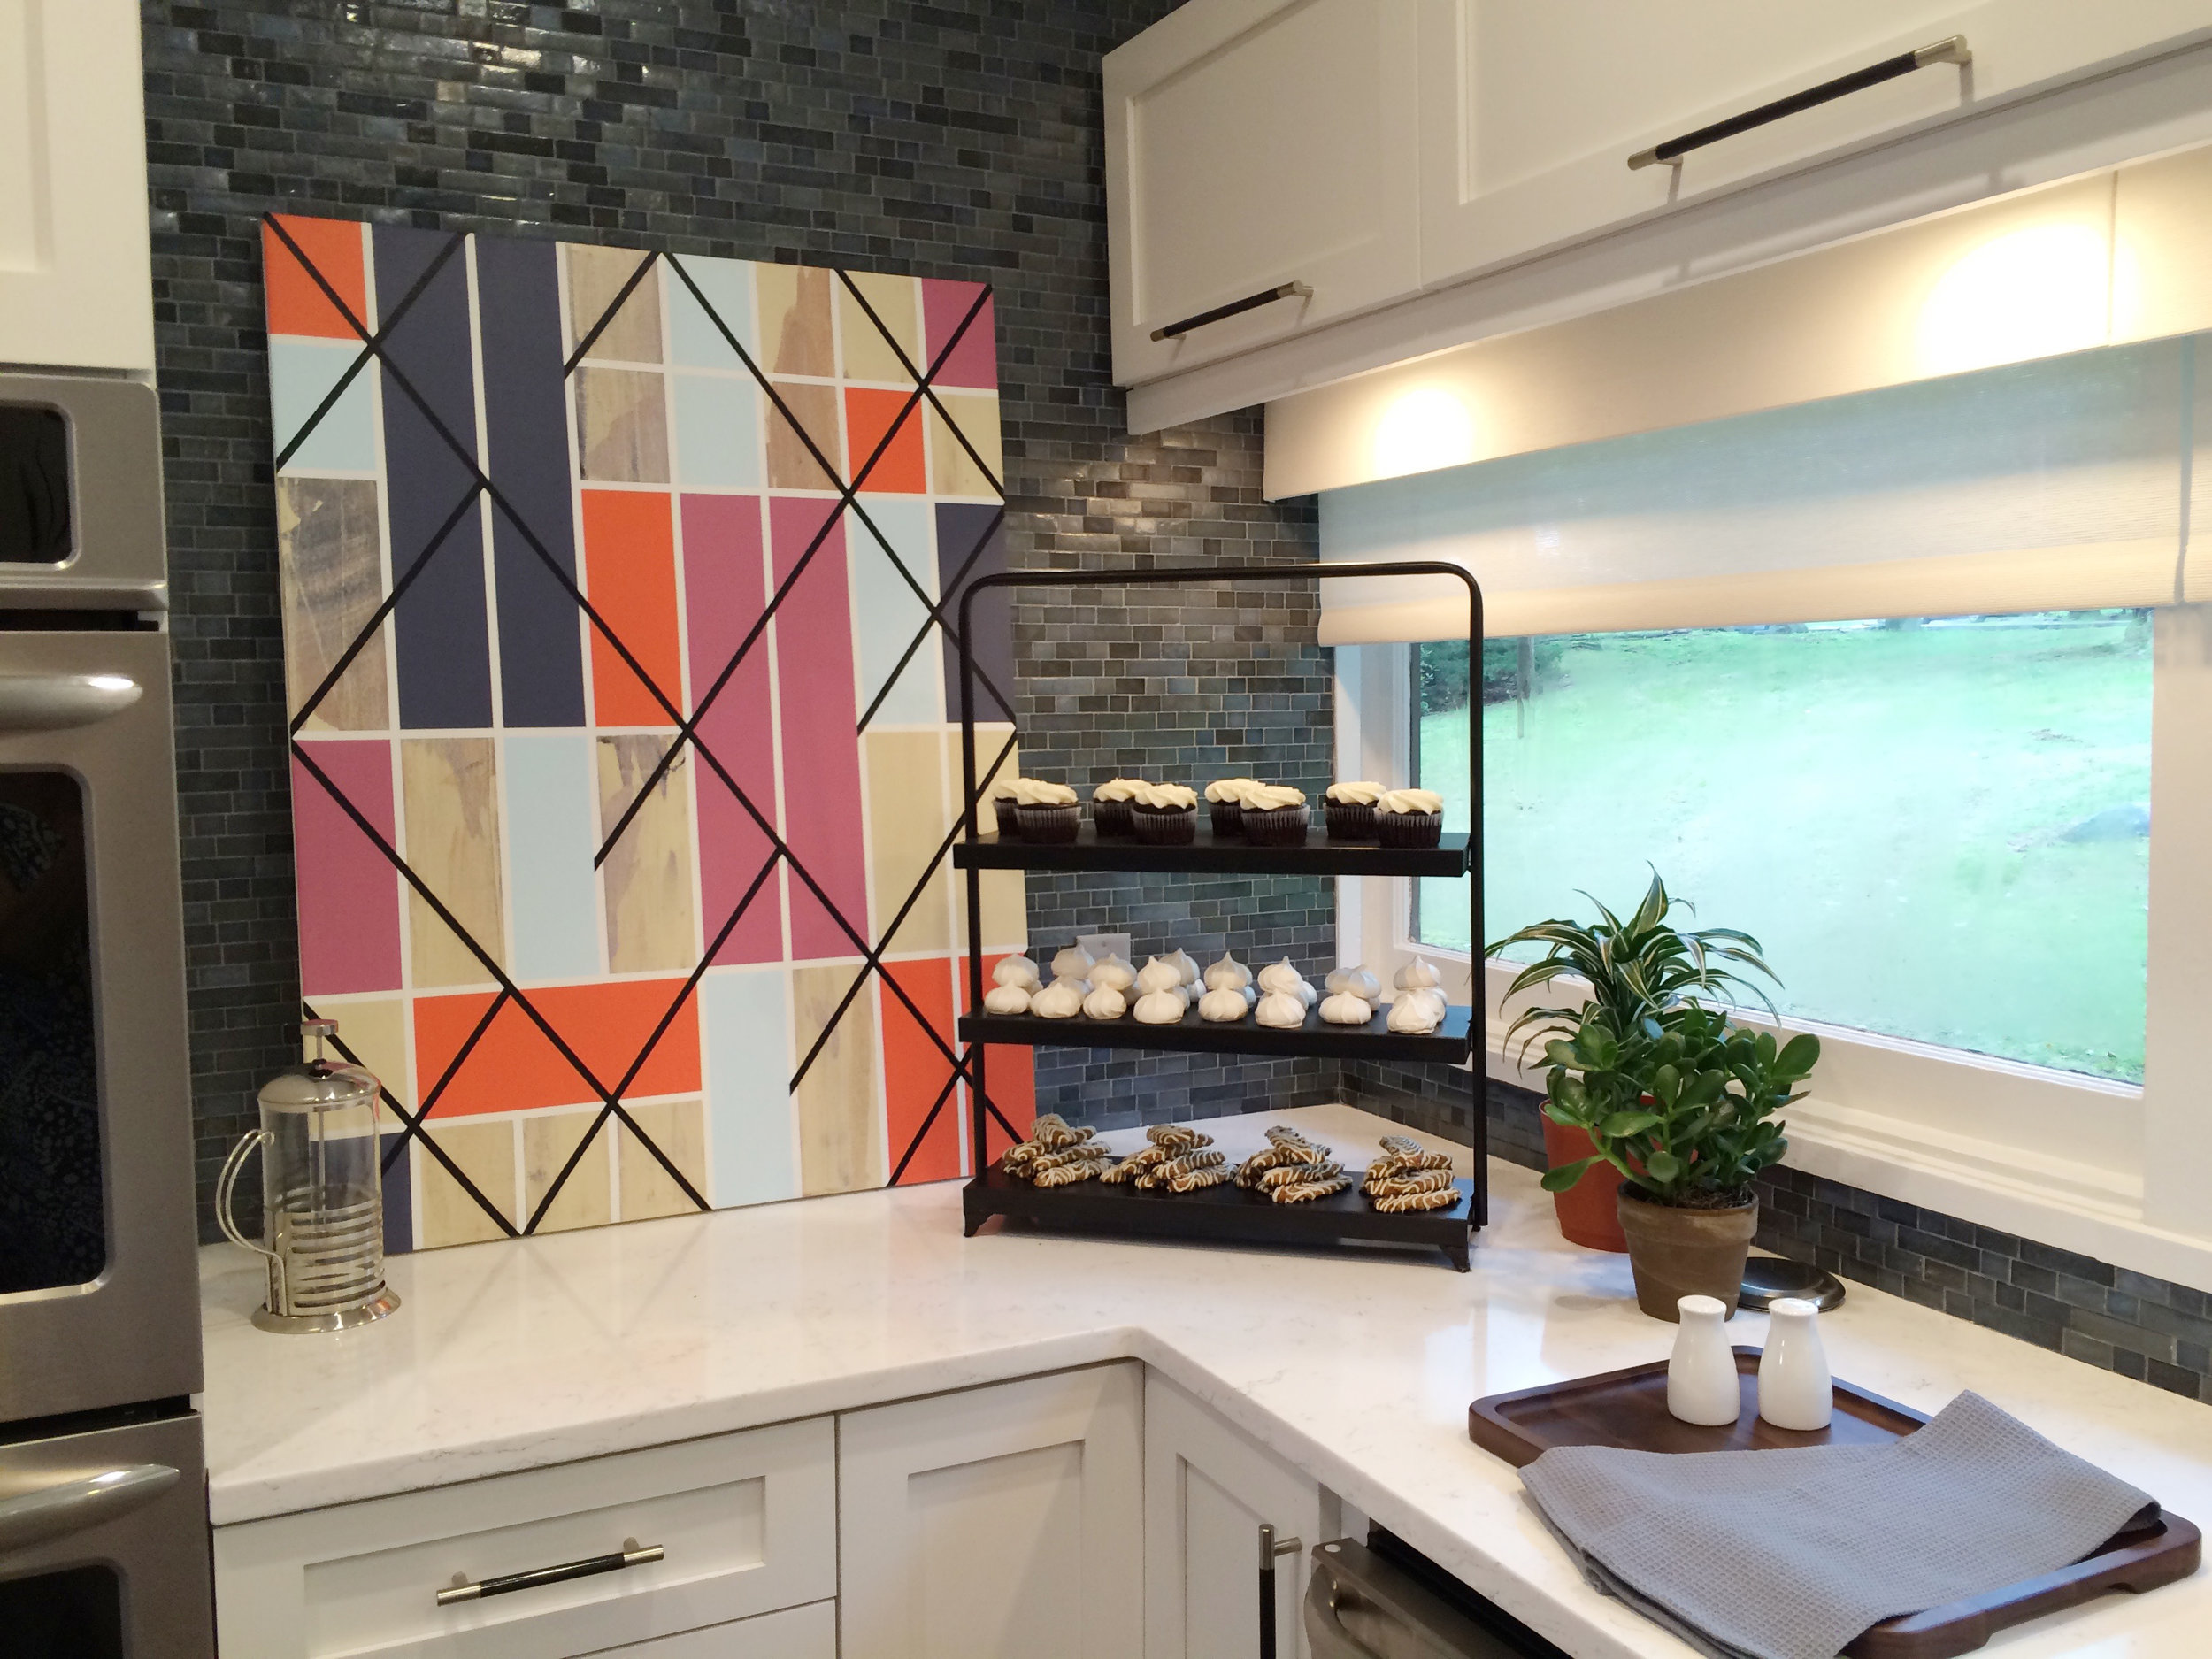 Kim A Mitchell_Design Lead_HGTV_The Property Brothers_Season 6_Episode 9_Kitchen_Blue Glass Tile Backsplash_Kenise Barnes Fine Art_Emtek Hardware_Modern Kitchen_2017.jpg